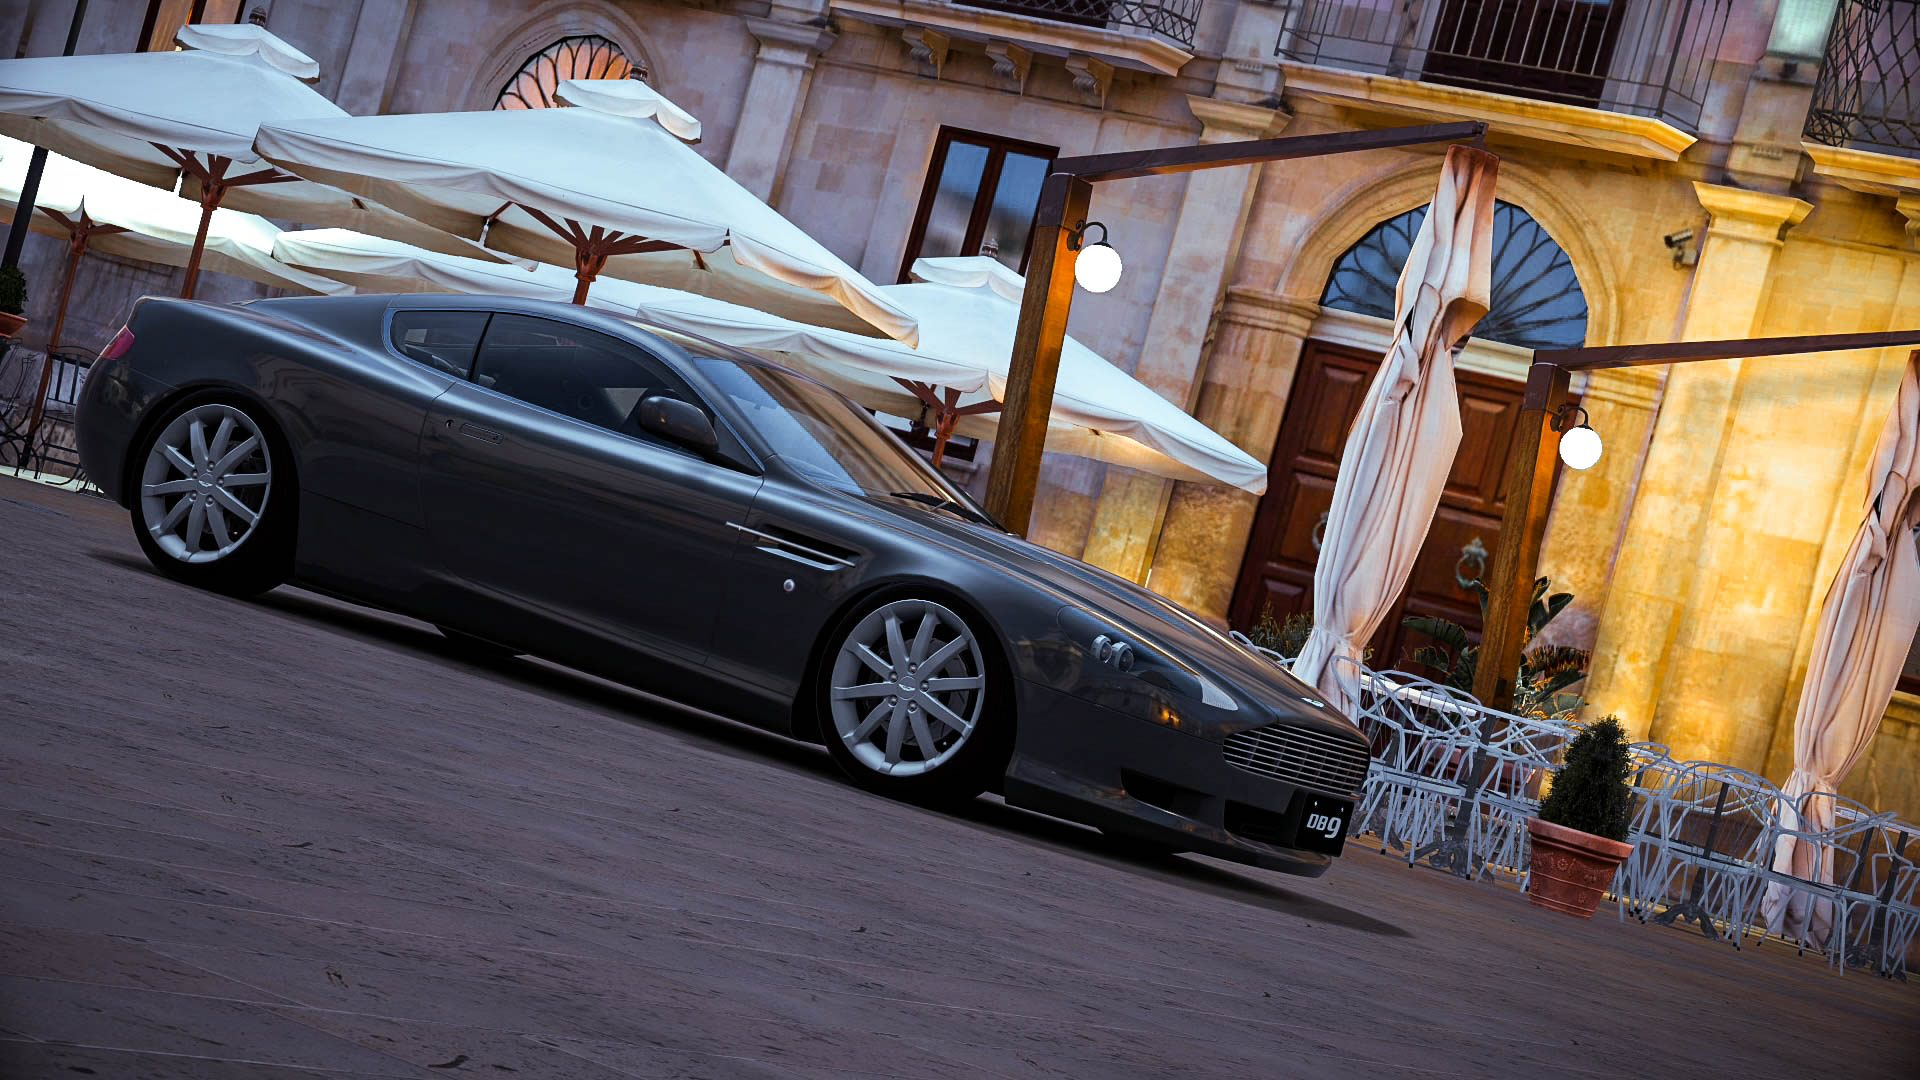 AstonMartin_Italy_5.jpg